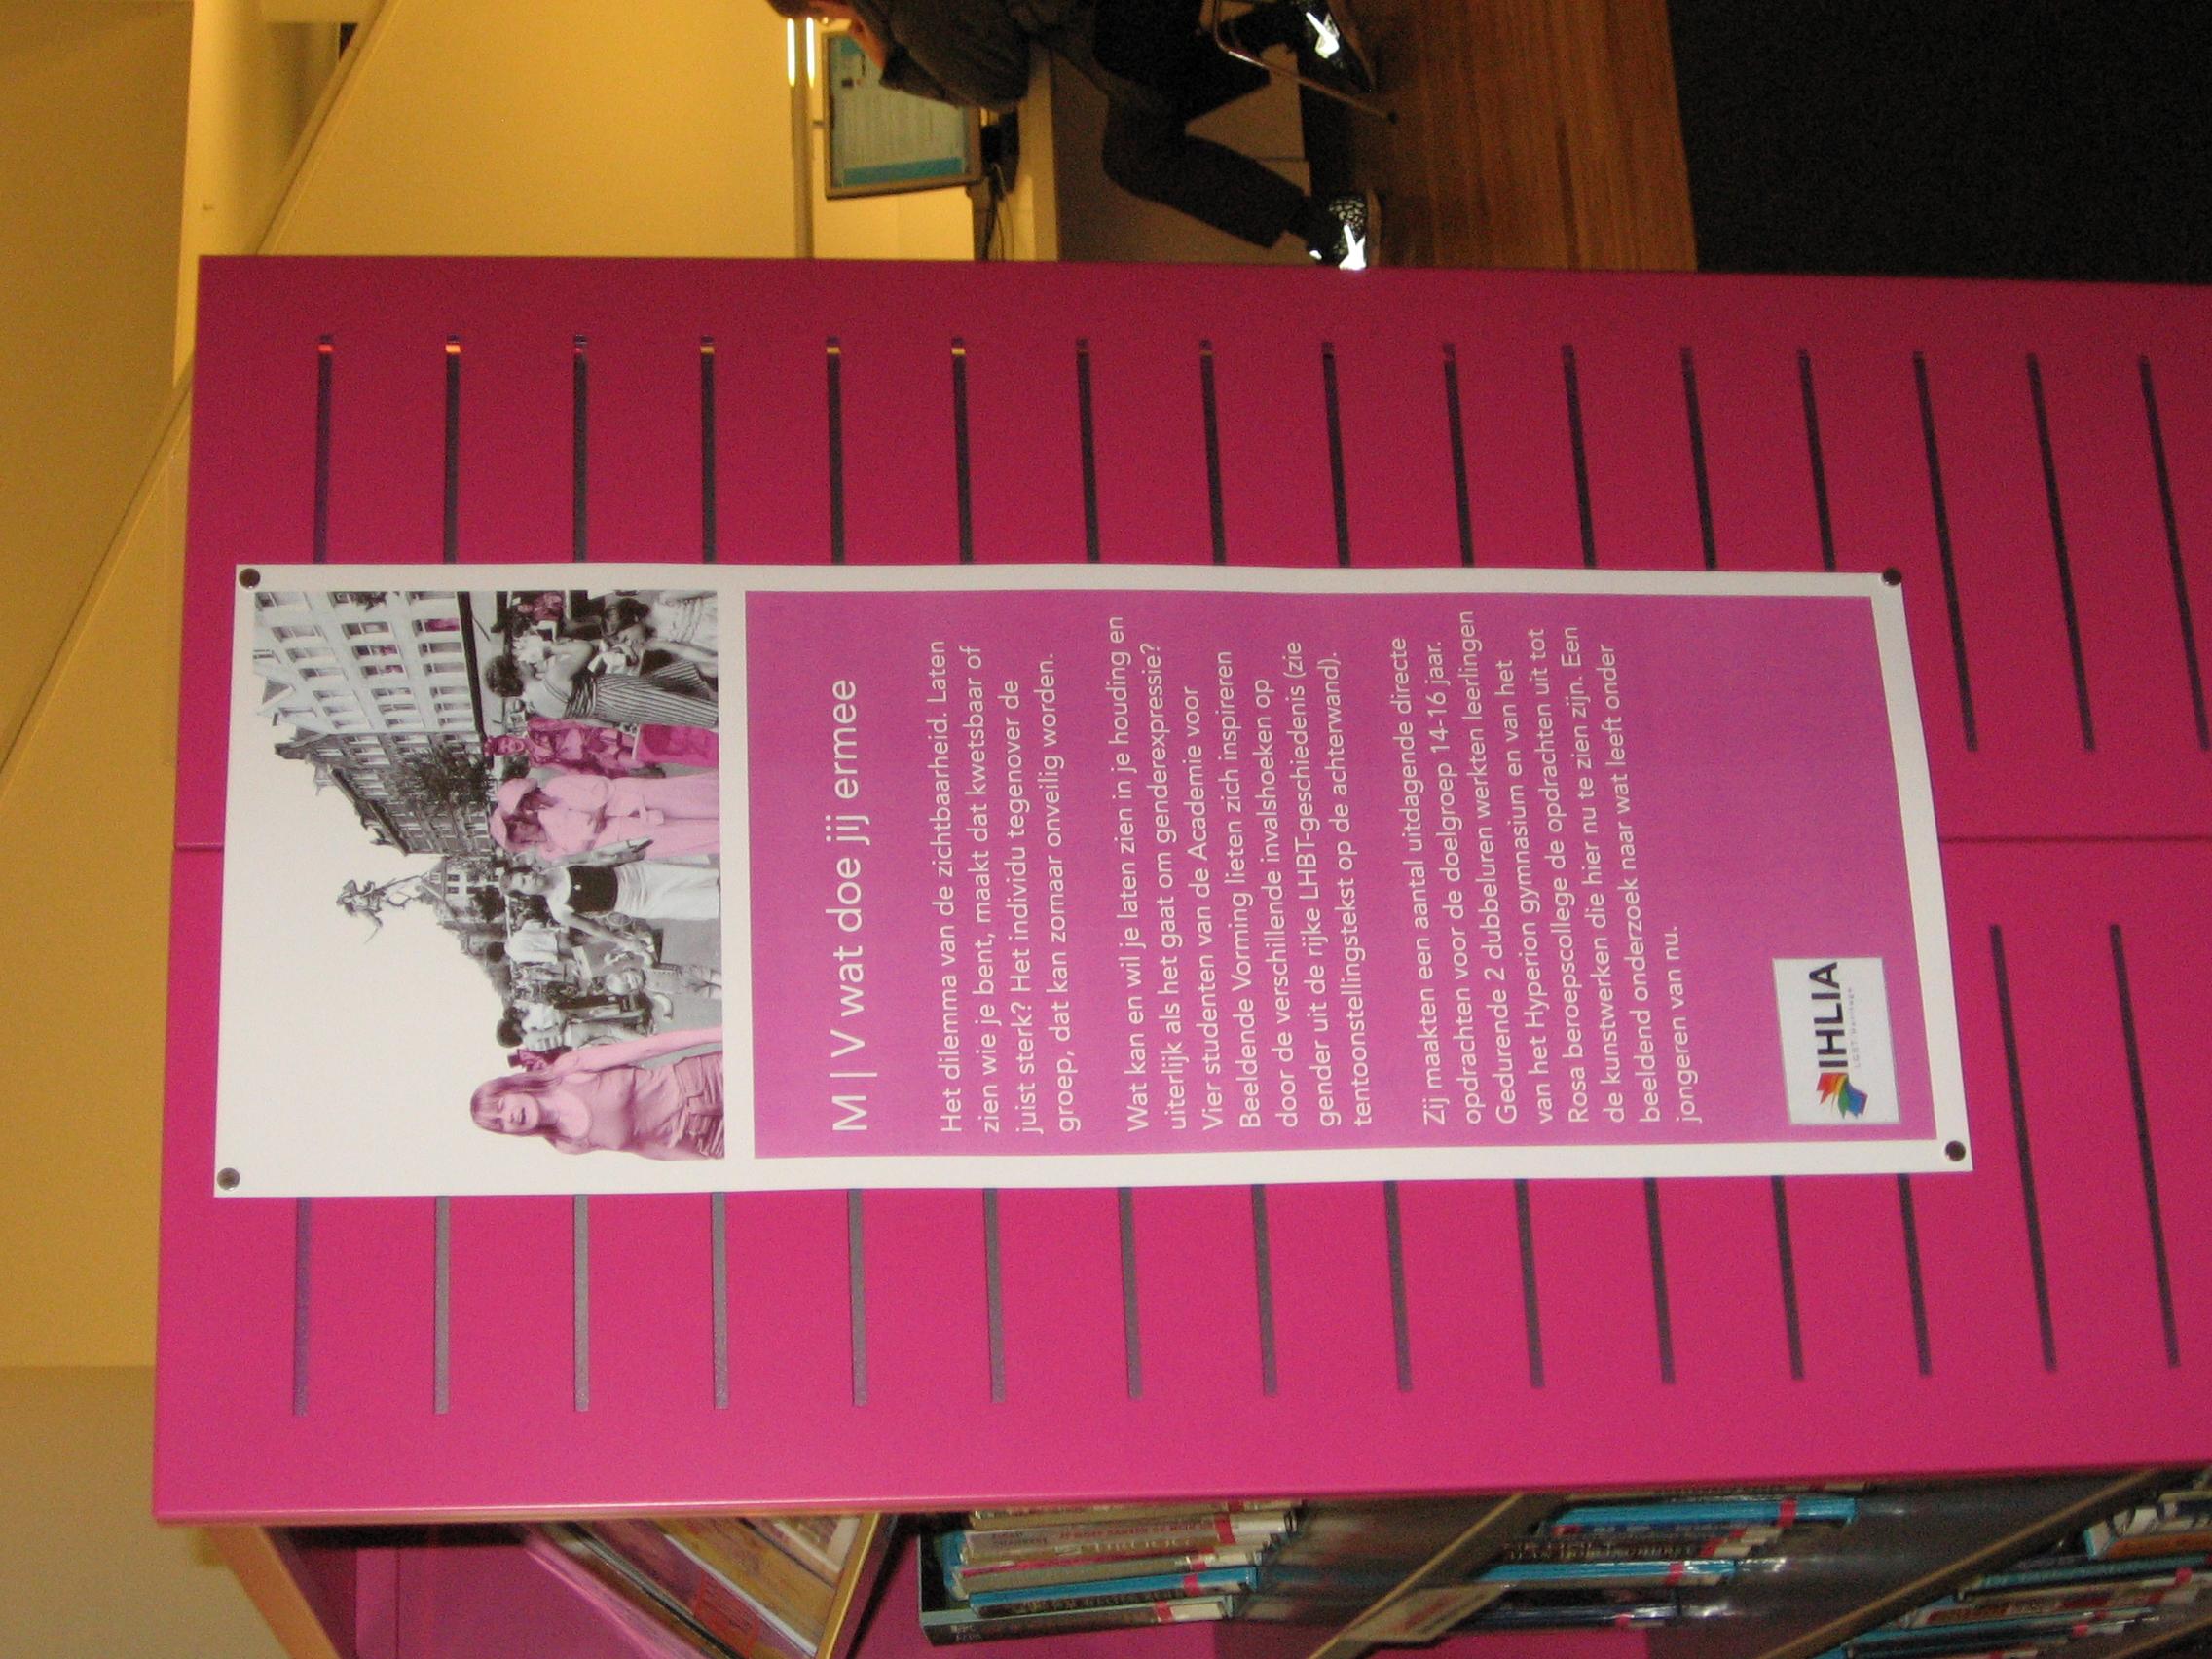 Fileihlia Lgbt Heritage Roze Kast Affiche Mv Wat Doe Je Ermee